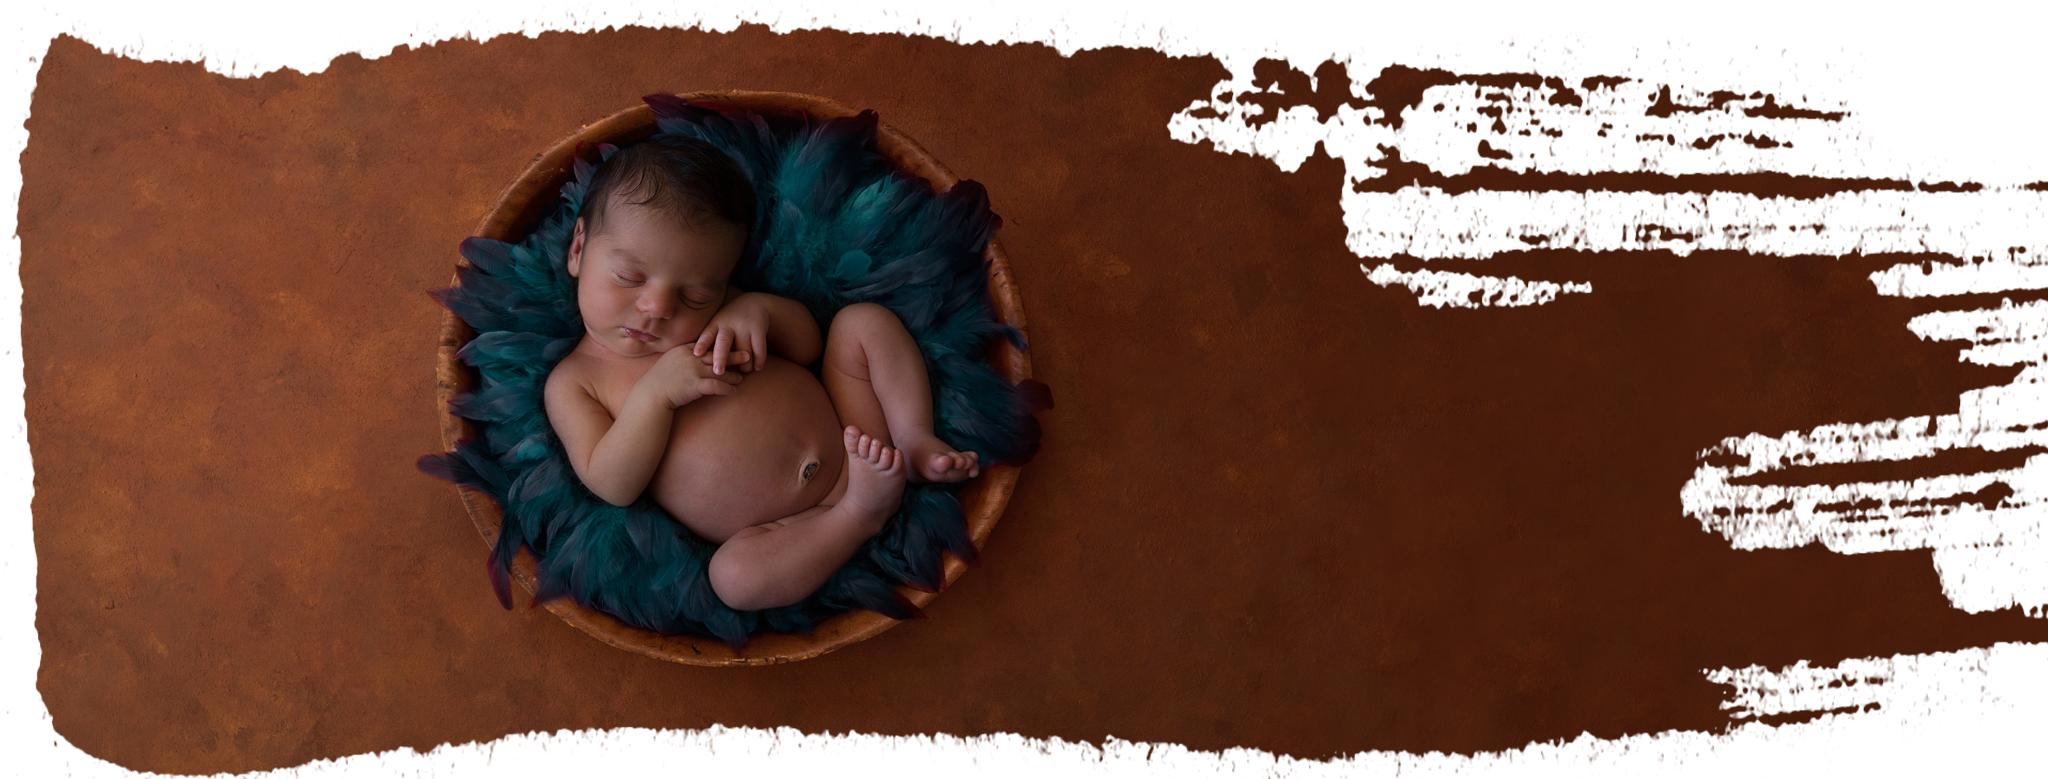 newborn gallery image.png